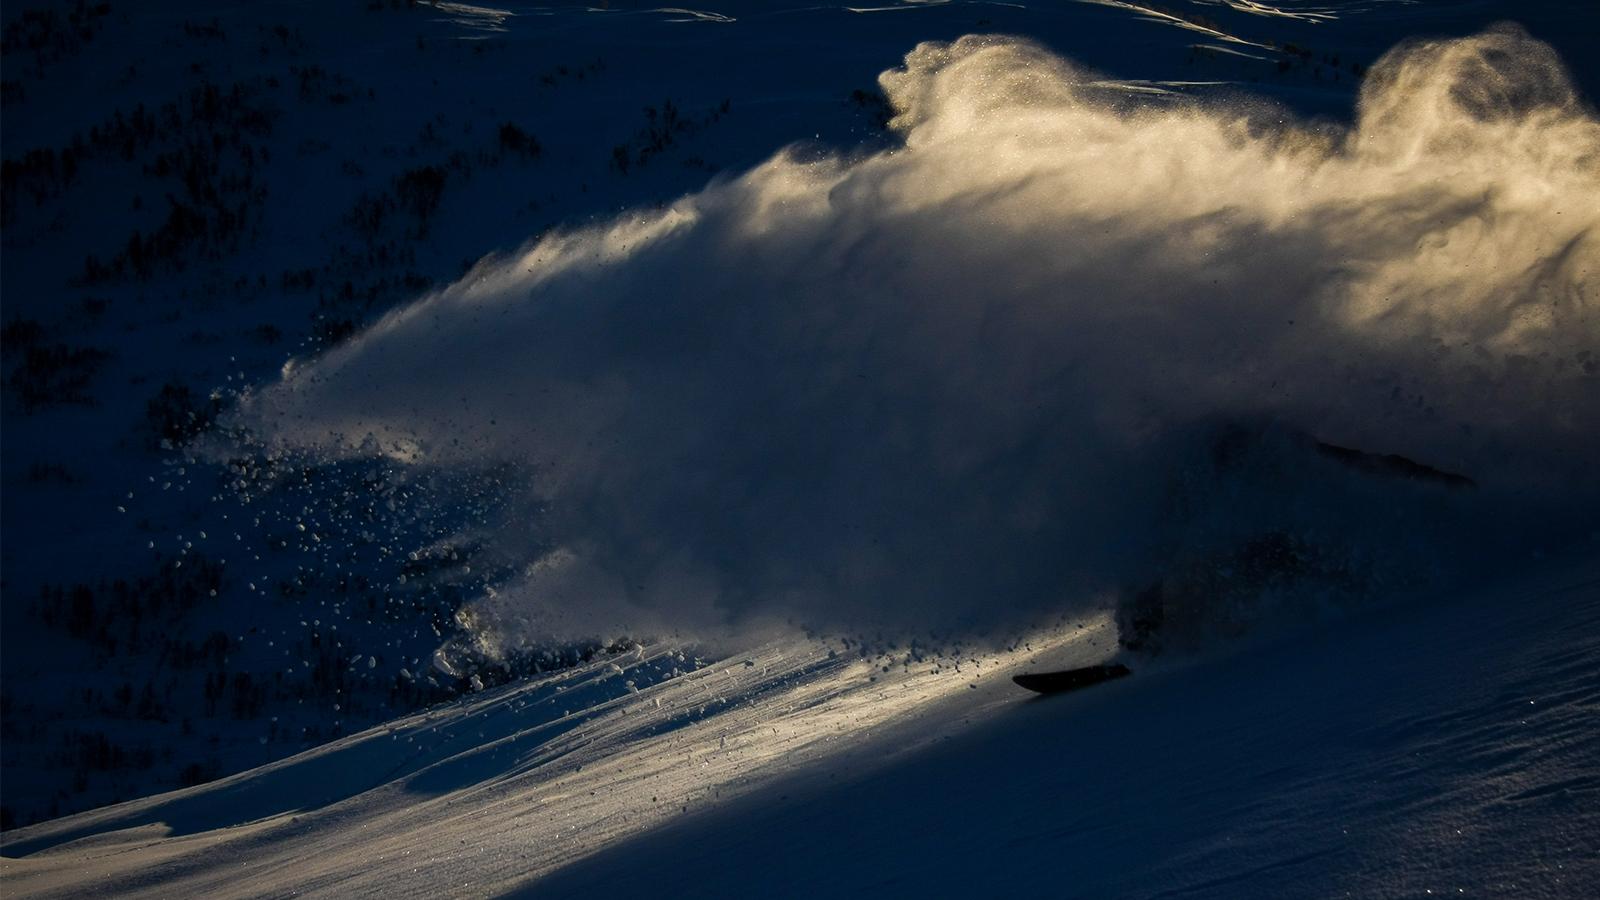 Furberg-Snowboards-Photo-Terje-Valen-Hølhjelle